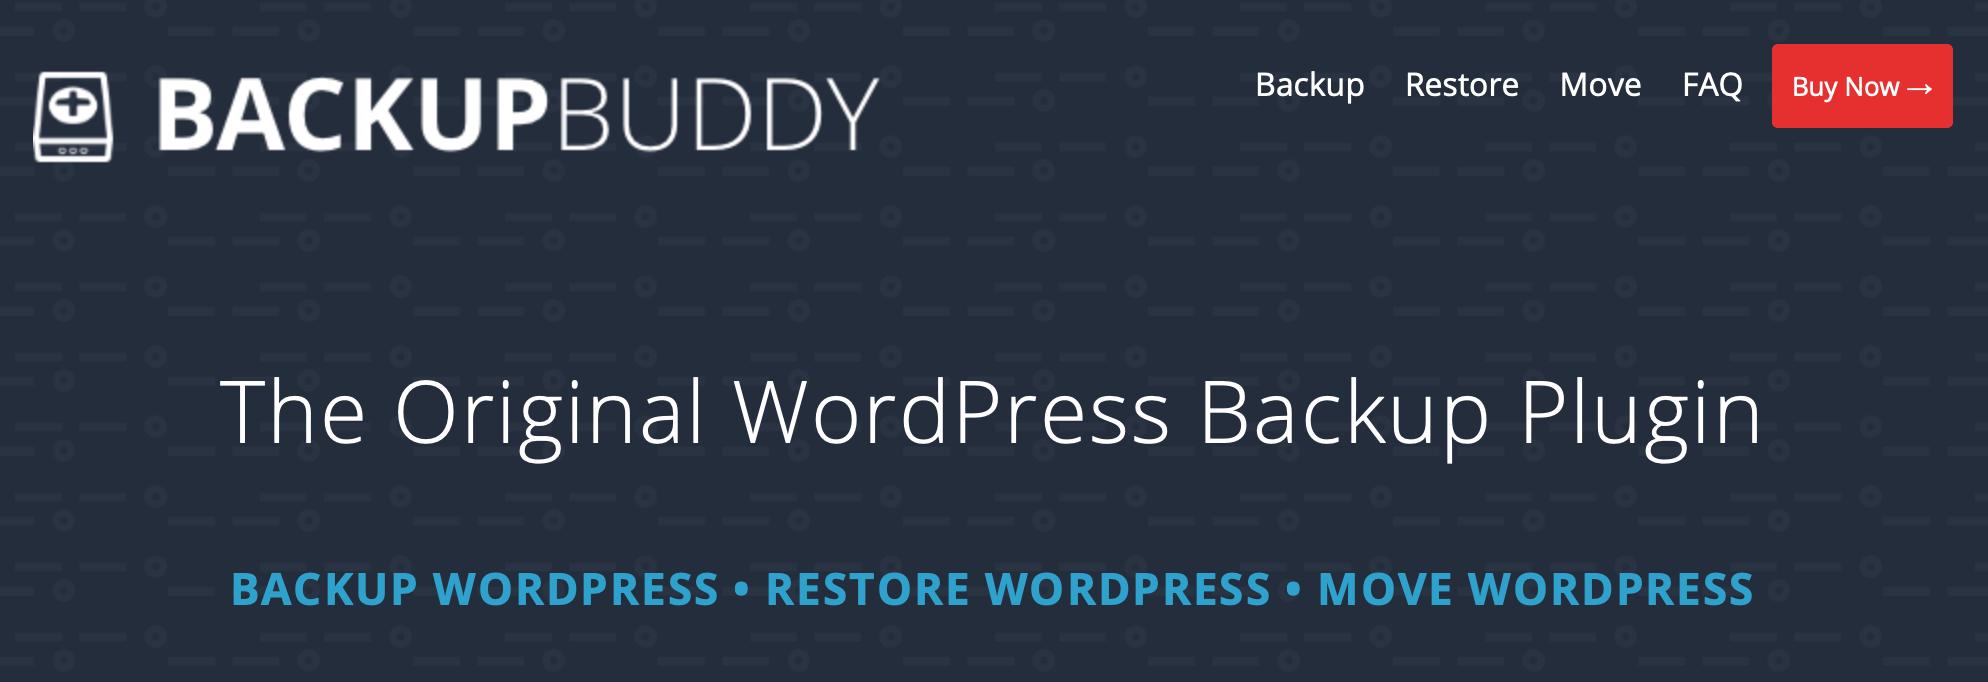 BackupBuddy is one of the best VaultPress alternatives